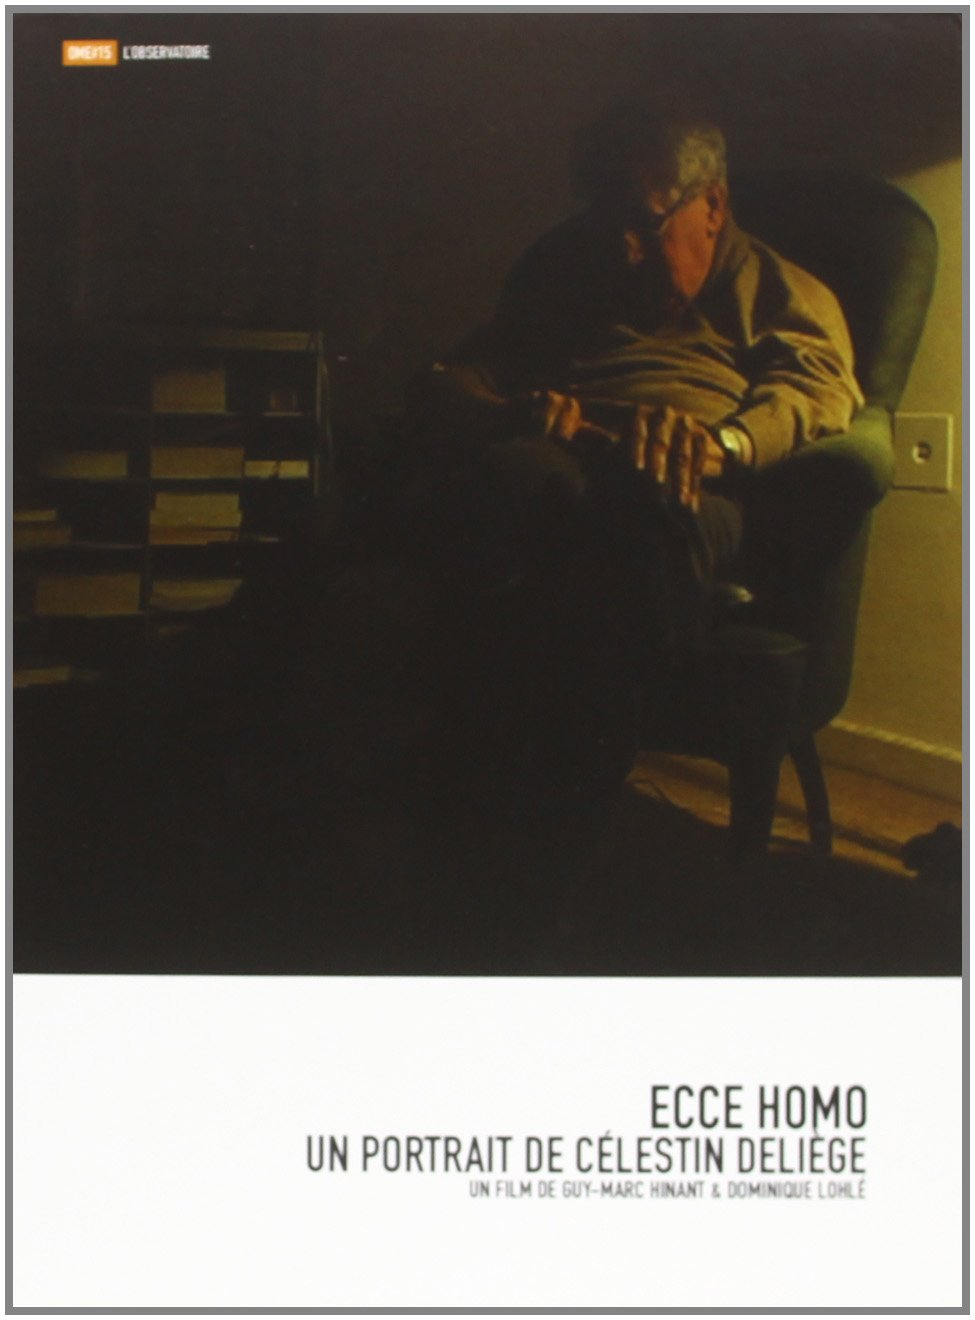 DVD : François Nicolas - Ecce Homo: A Portrait Of Celestin Deliege (DVD)